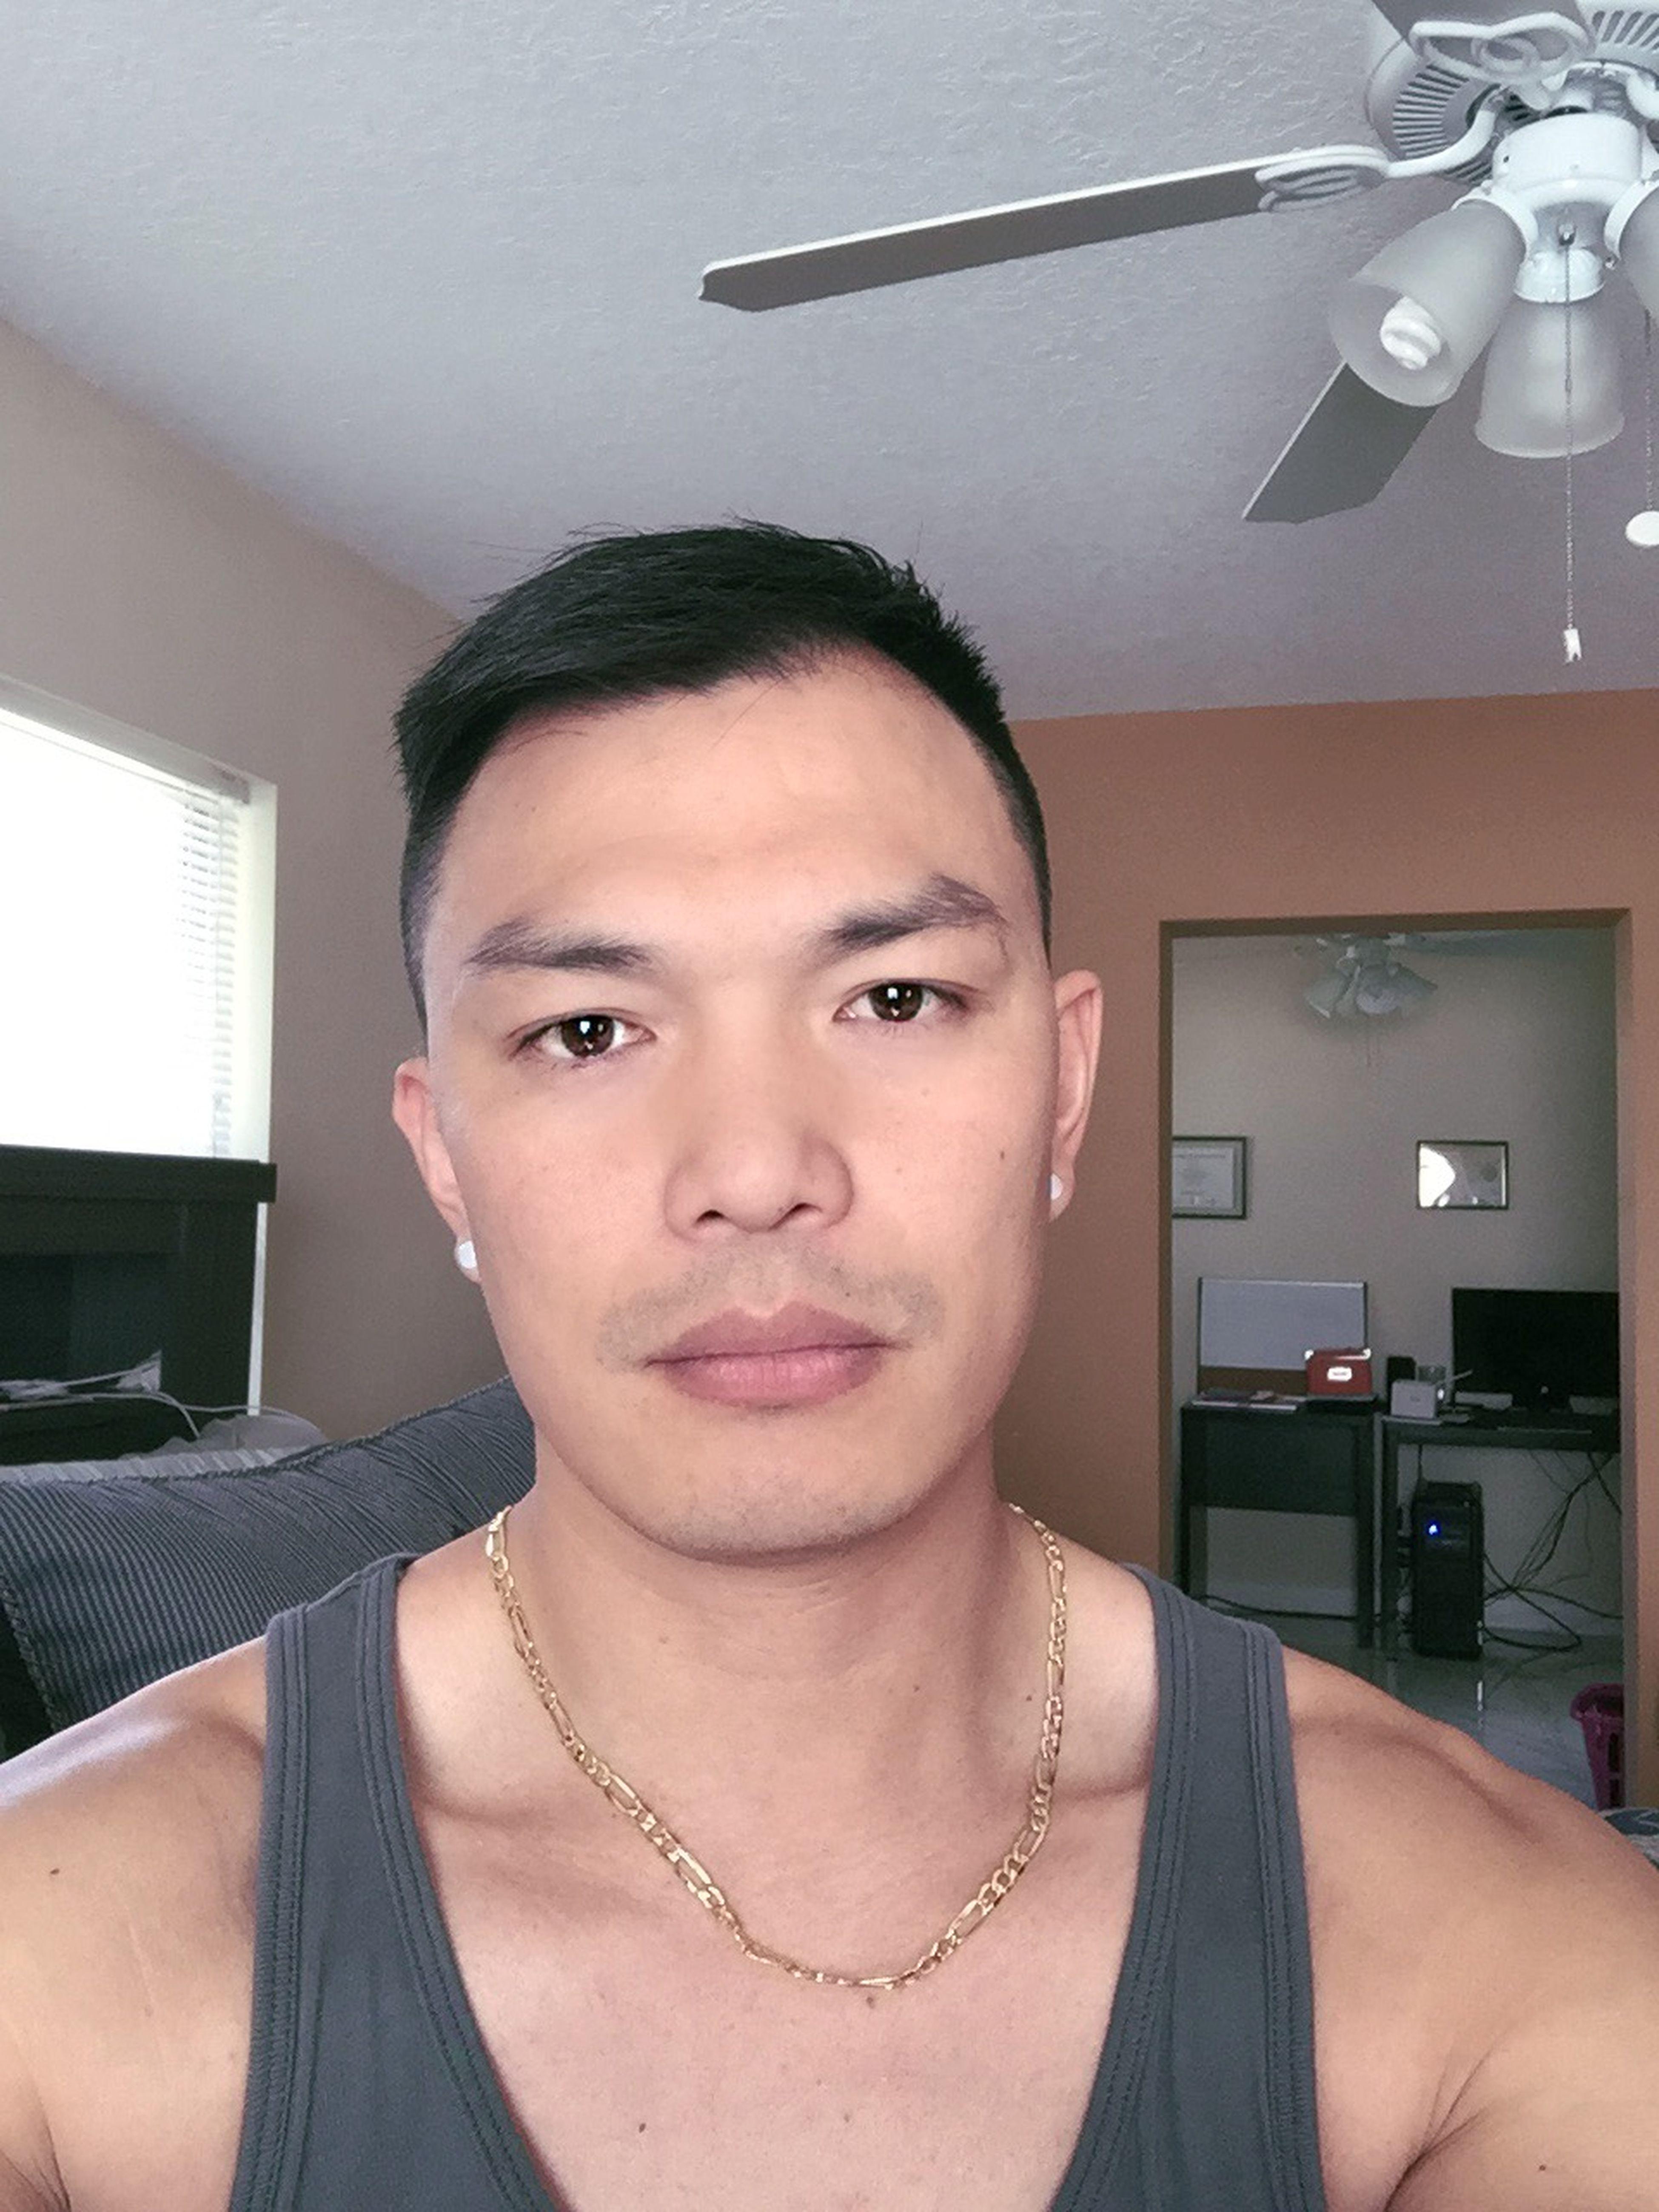 New Haircut Turning 38 Selfportrait Selfie ✌